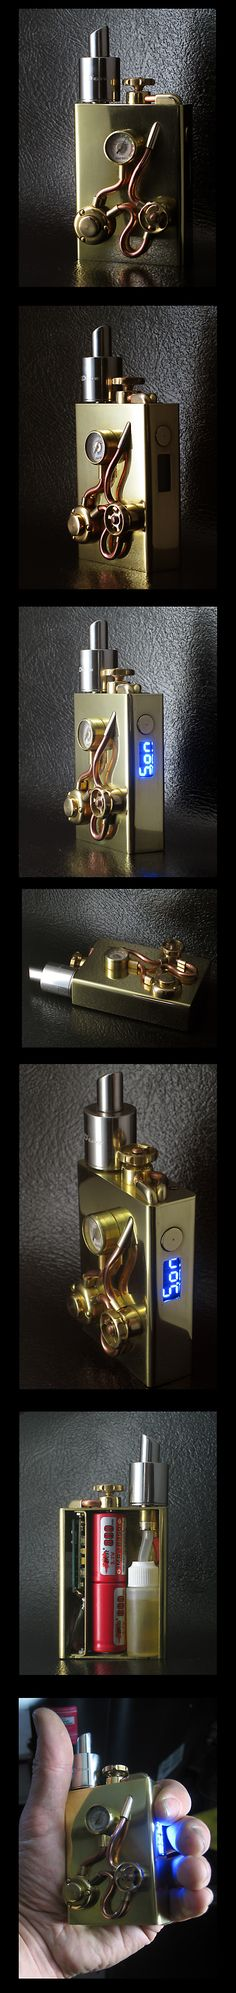 Rare Squonker #vape #boxmods #steampunk #vapeporn #vapelife #waketovape #bbv #brokeballervapes